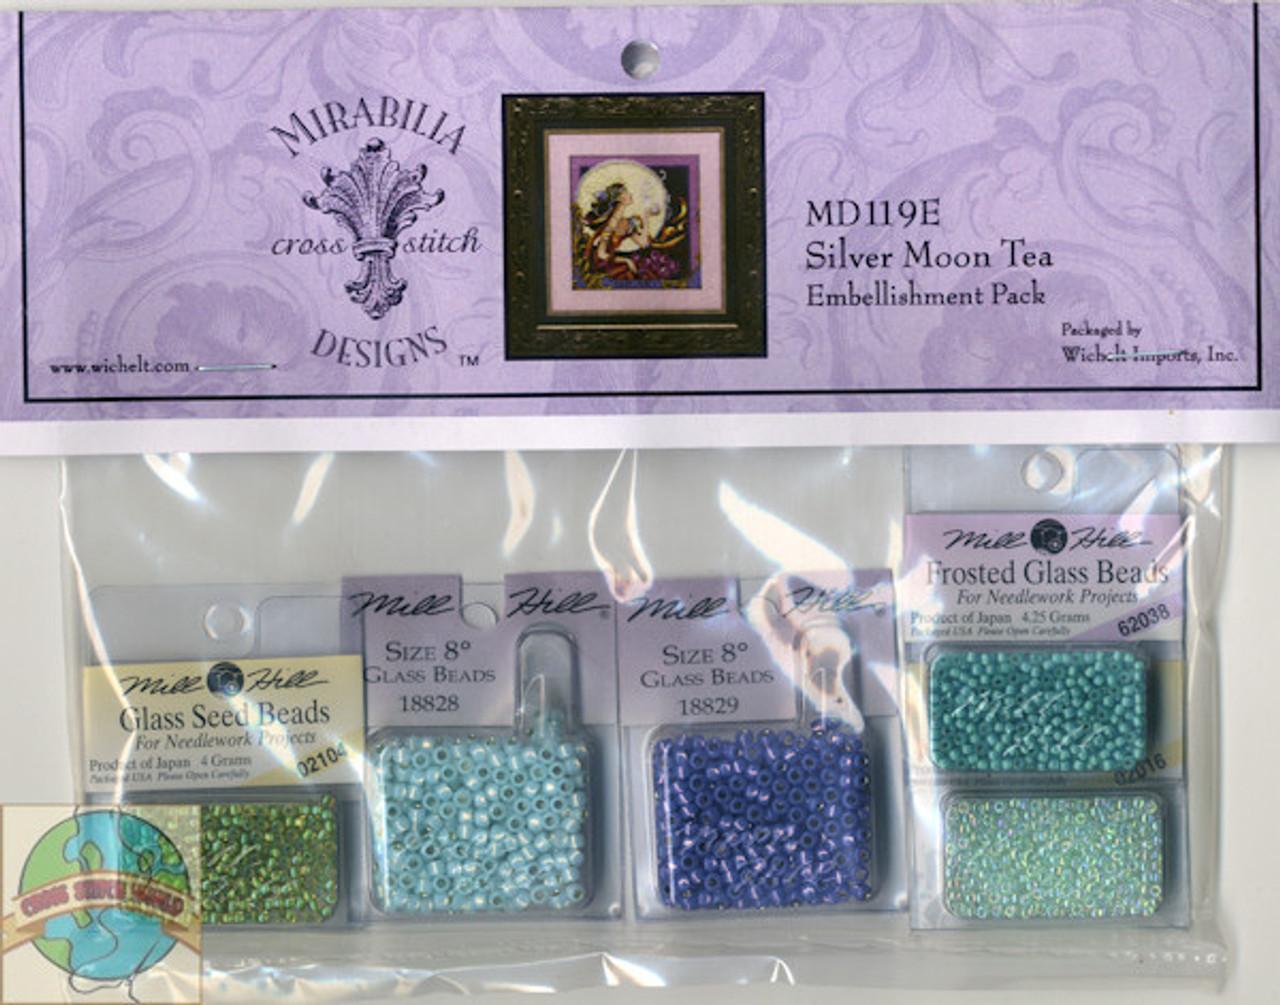 Mirabilia Embellishment Pack - Silver Moon Tea